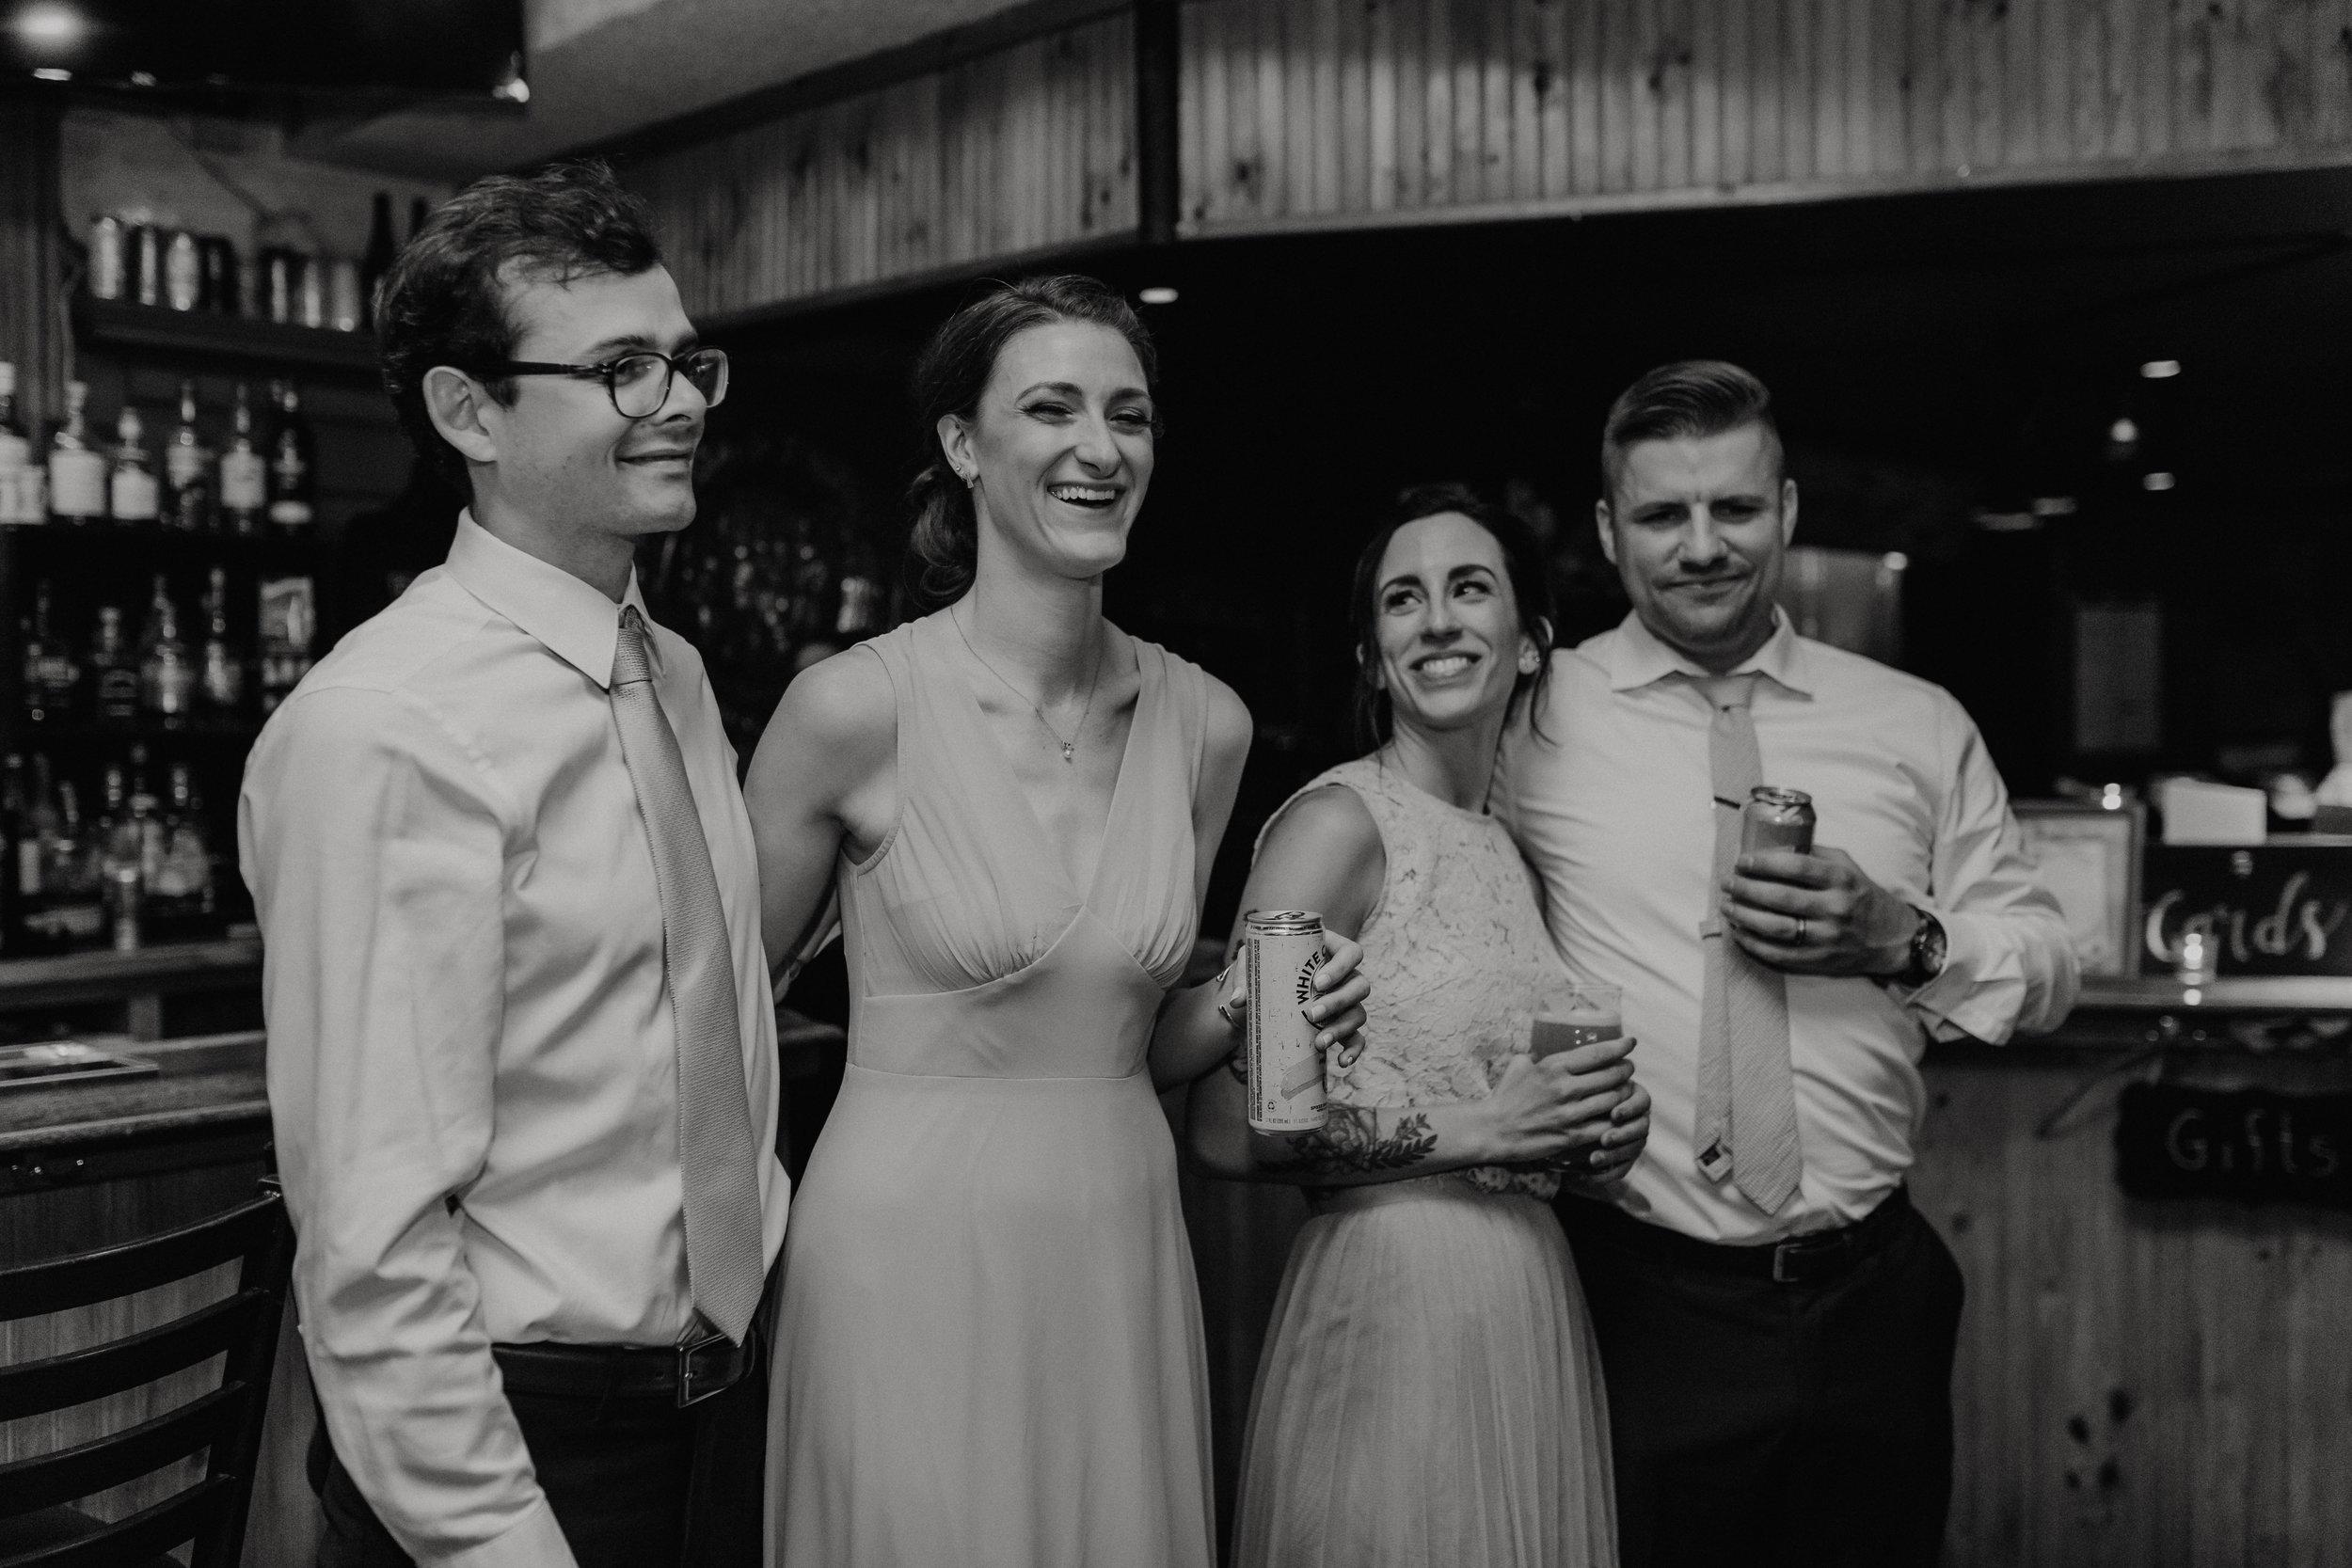 city-beer-hall-wedding-116.jpg